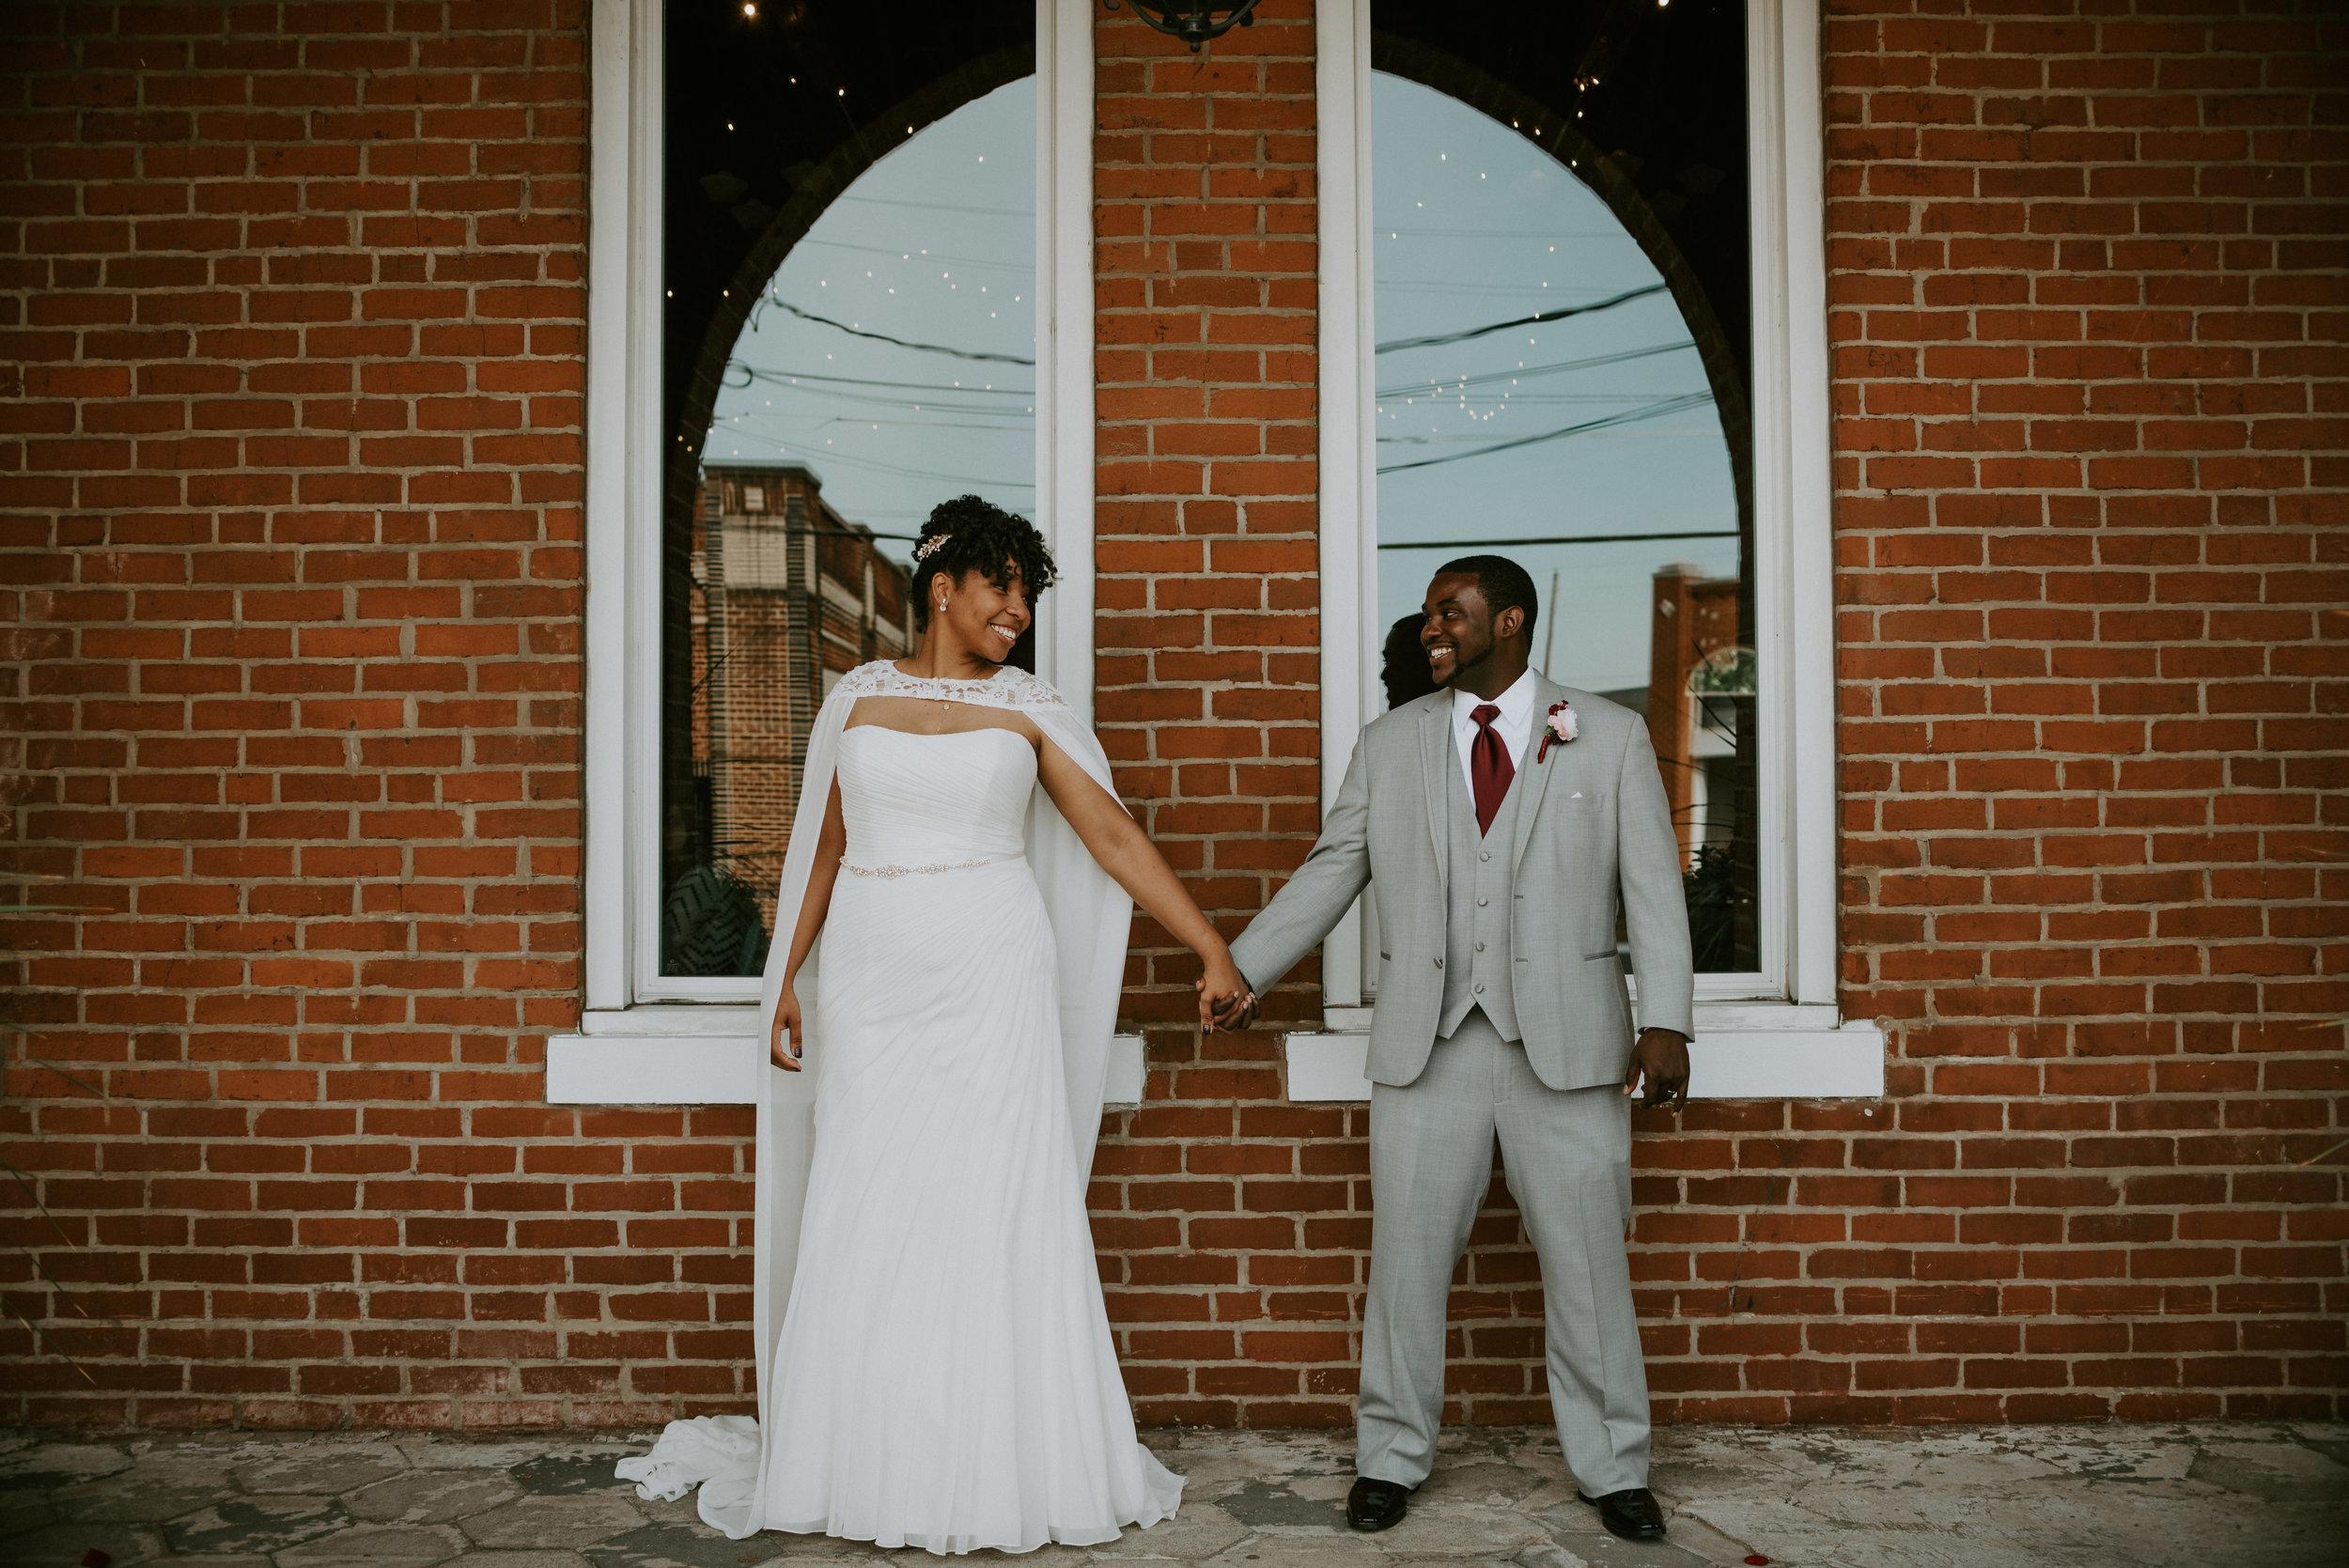 WonderlyCreative_Wedding_6.7.18_Khara&Dwayne_-703.jpg